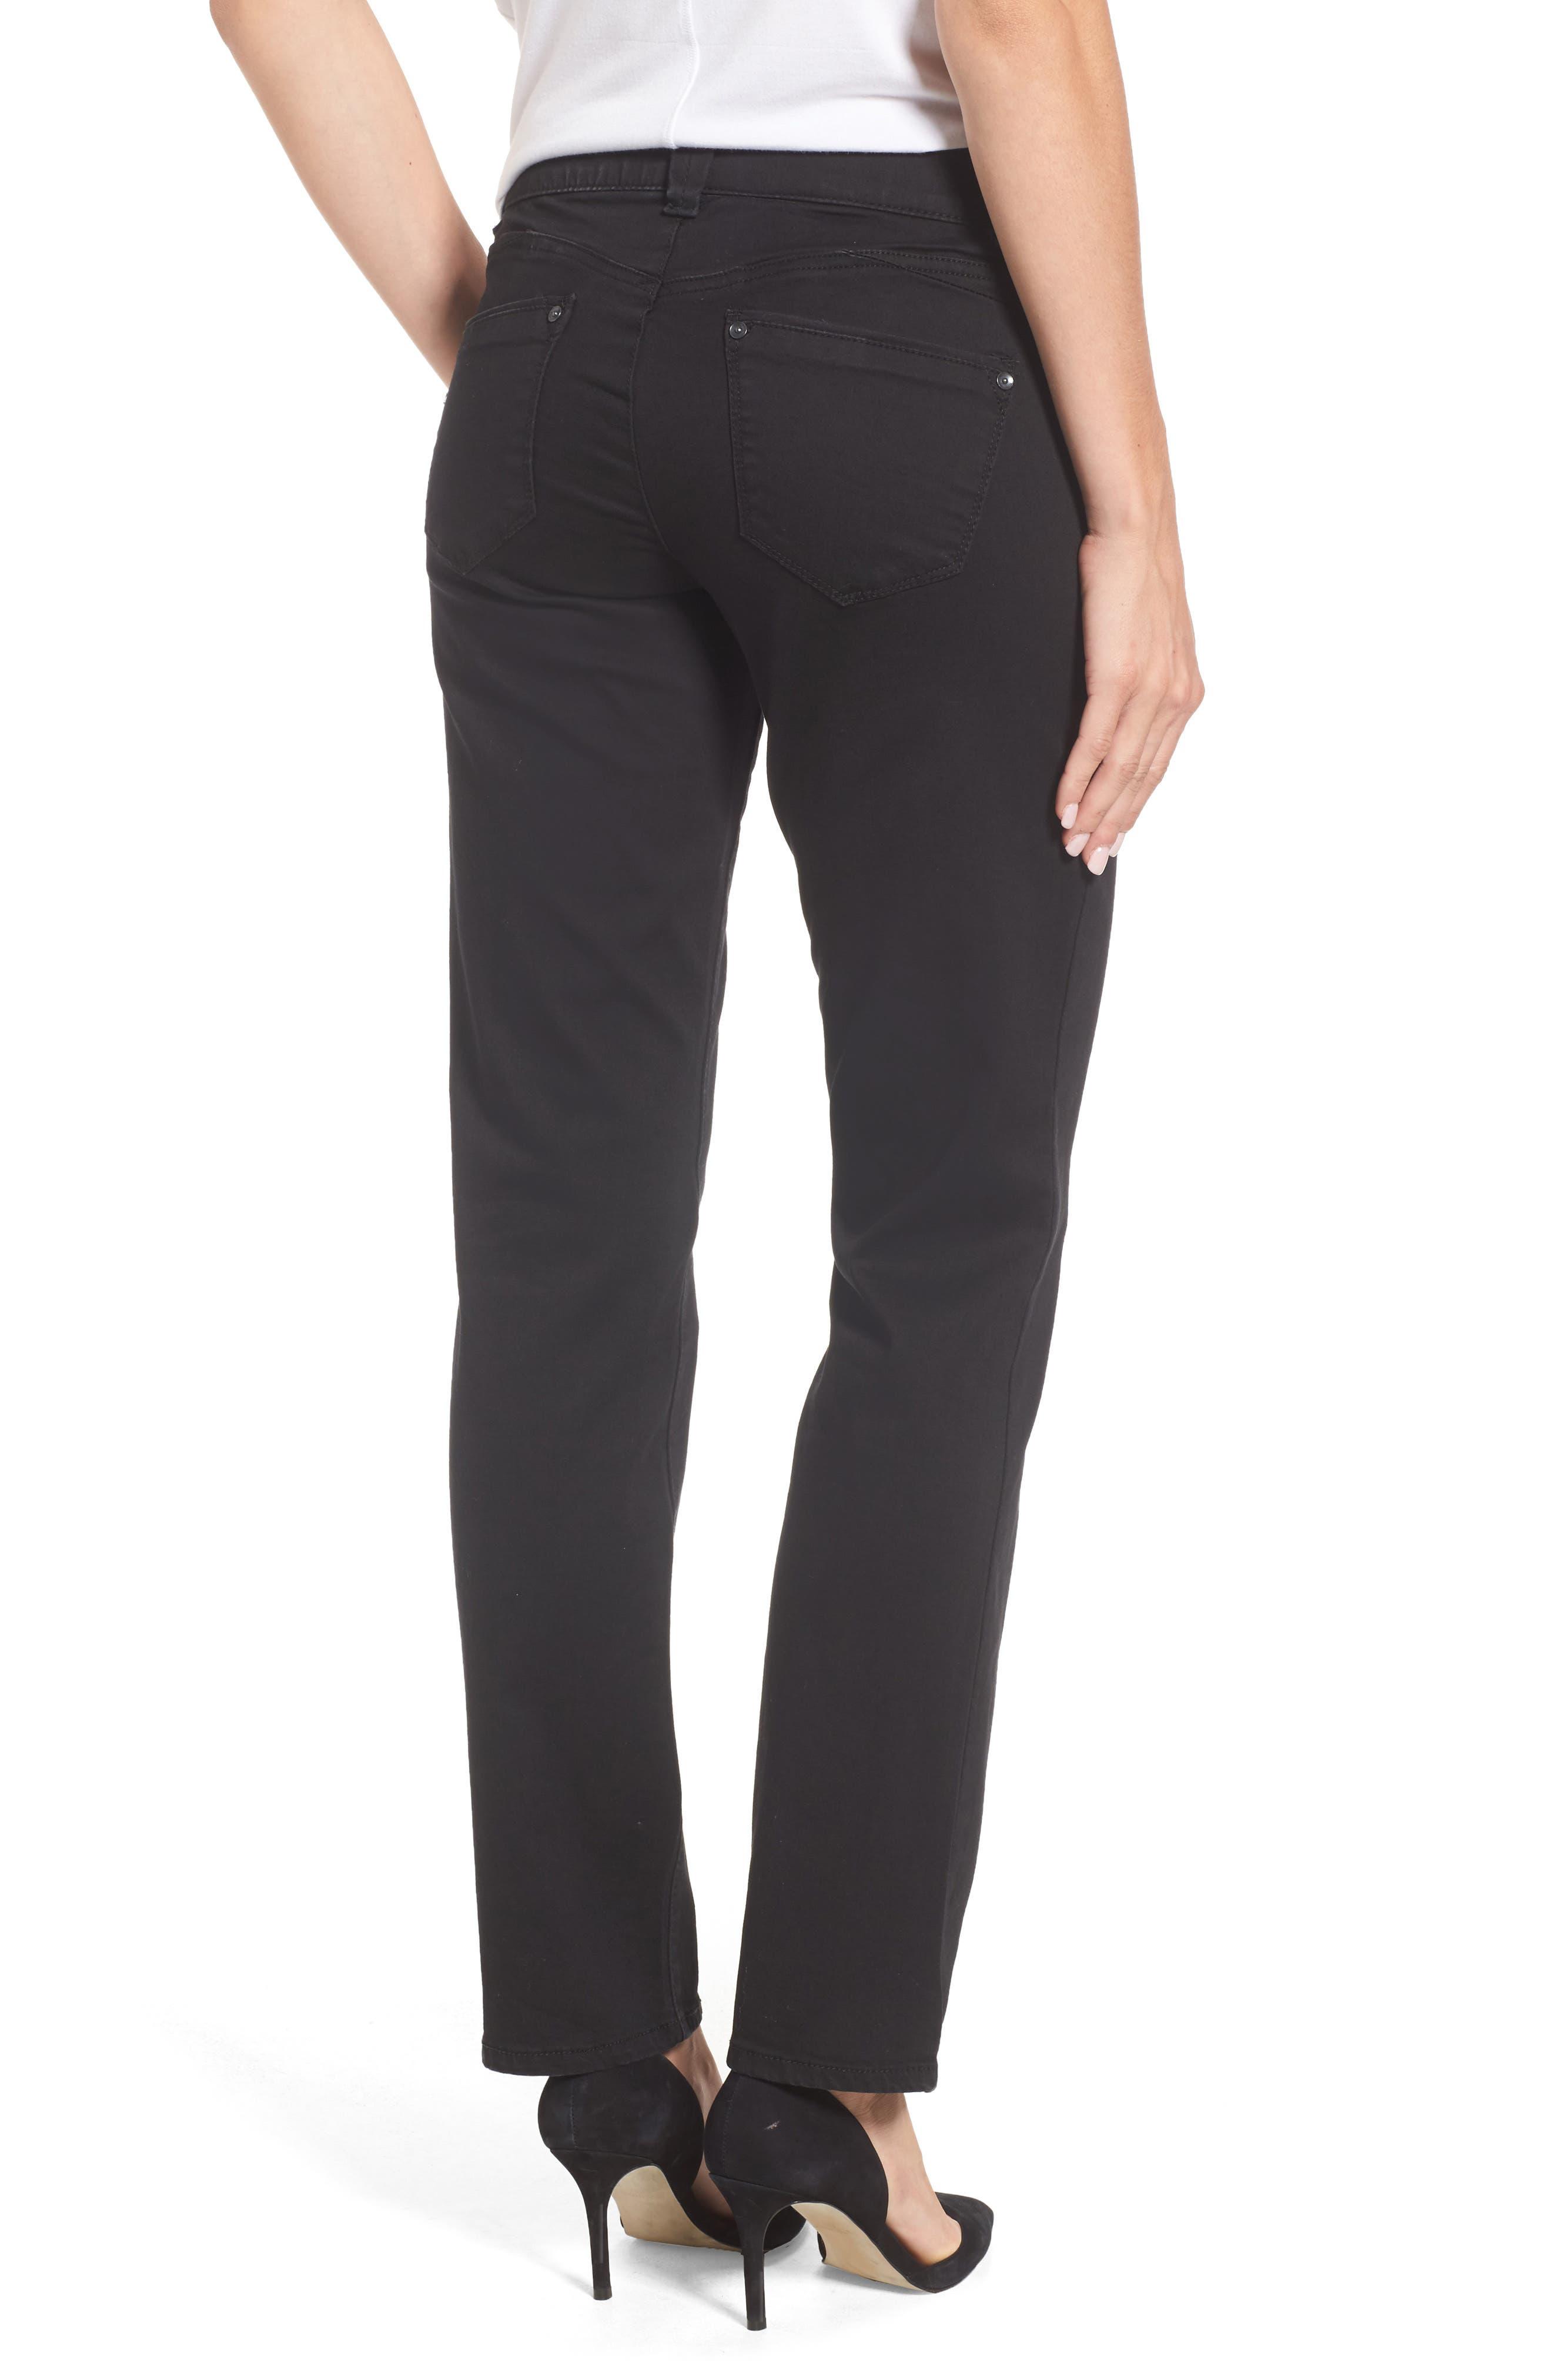 Ab-solution Straight Leg Jeans,                             Alternate thumbnail 2, color,                             BLACK